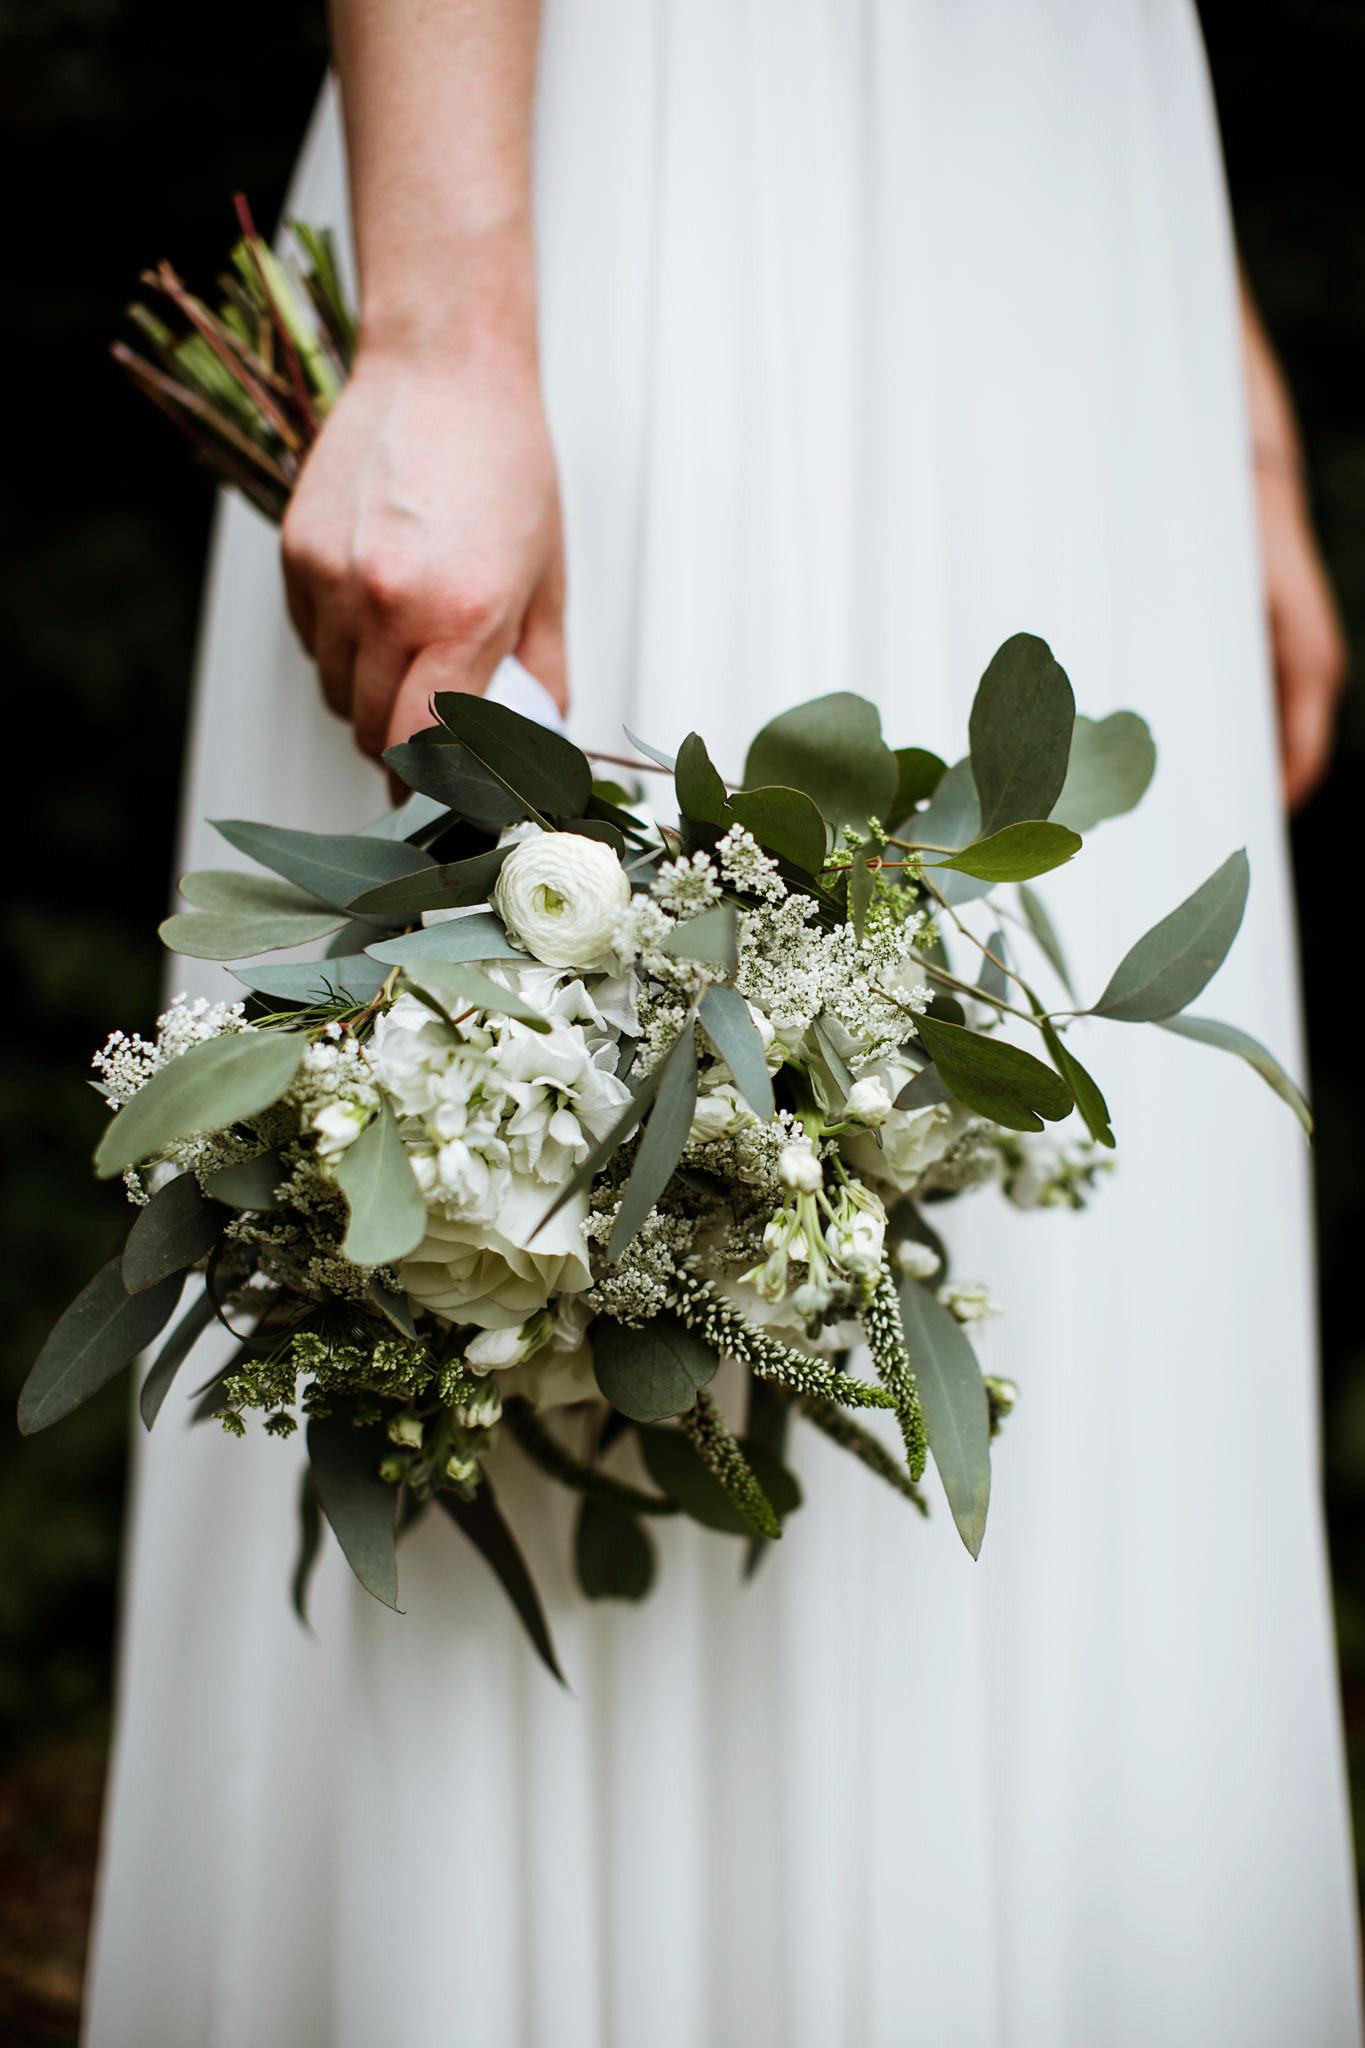 Cinder Block Brewery Wedding_Kindling Wedding Photography_01.JPG